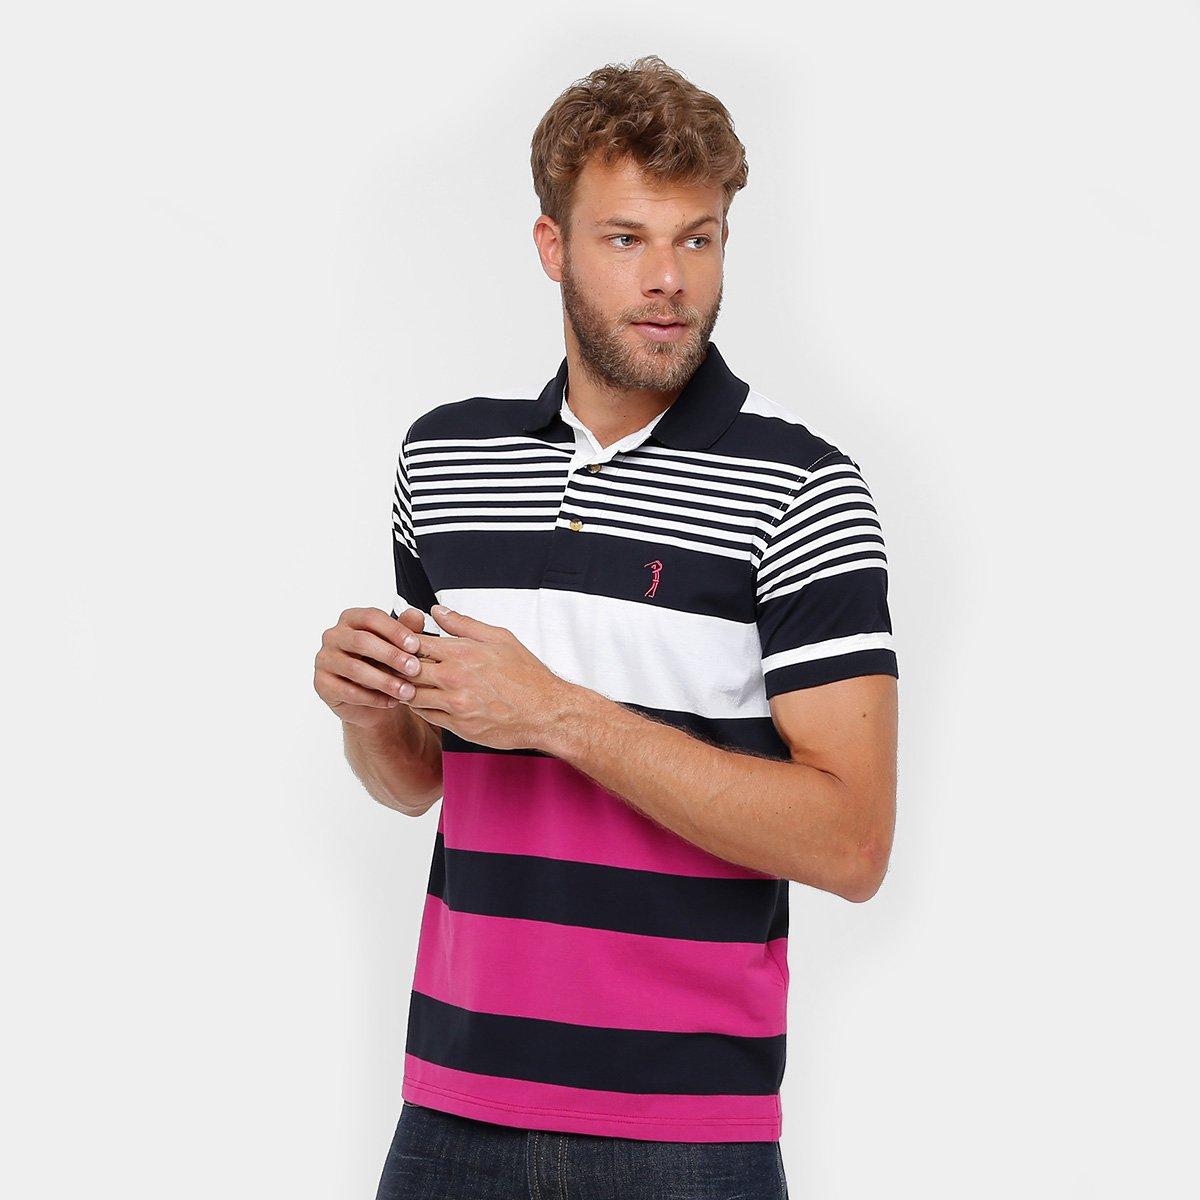 Camisa Polo Aleatory Listras Masculina - Compre Agora  b07f91c5541e0